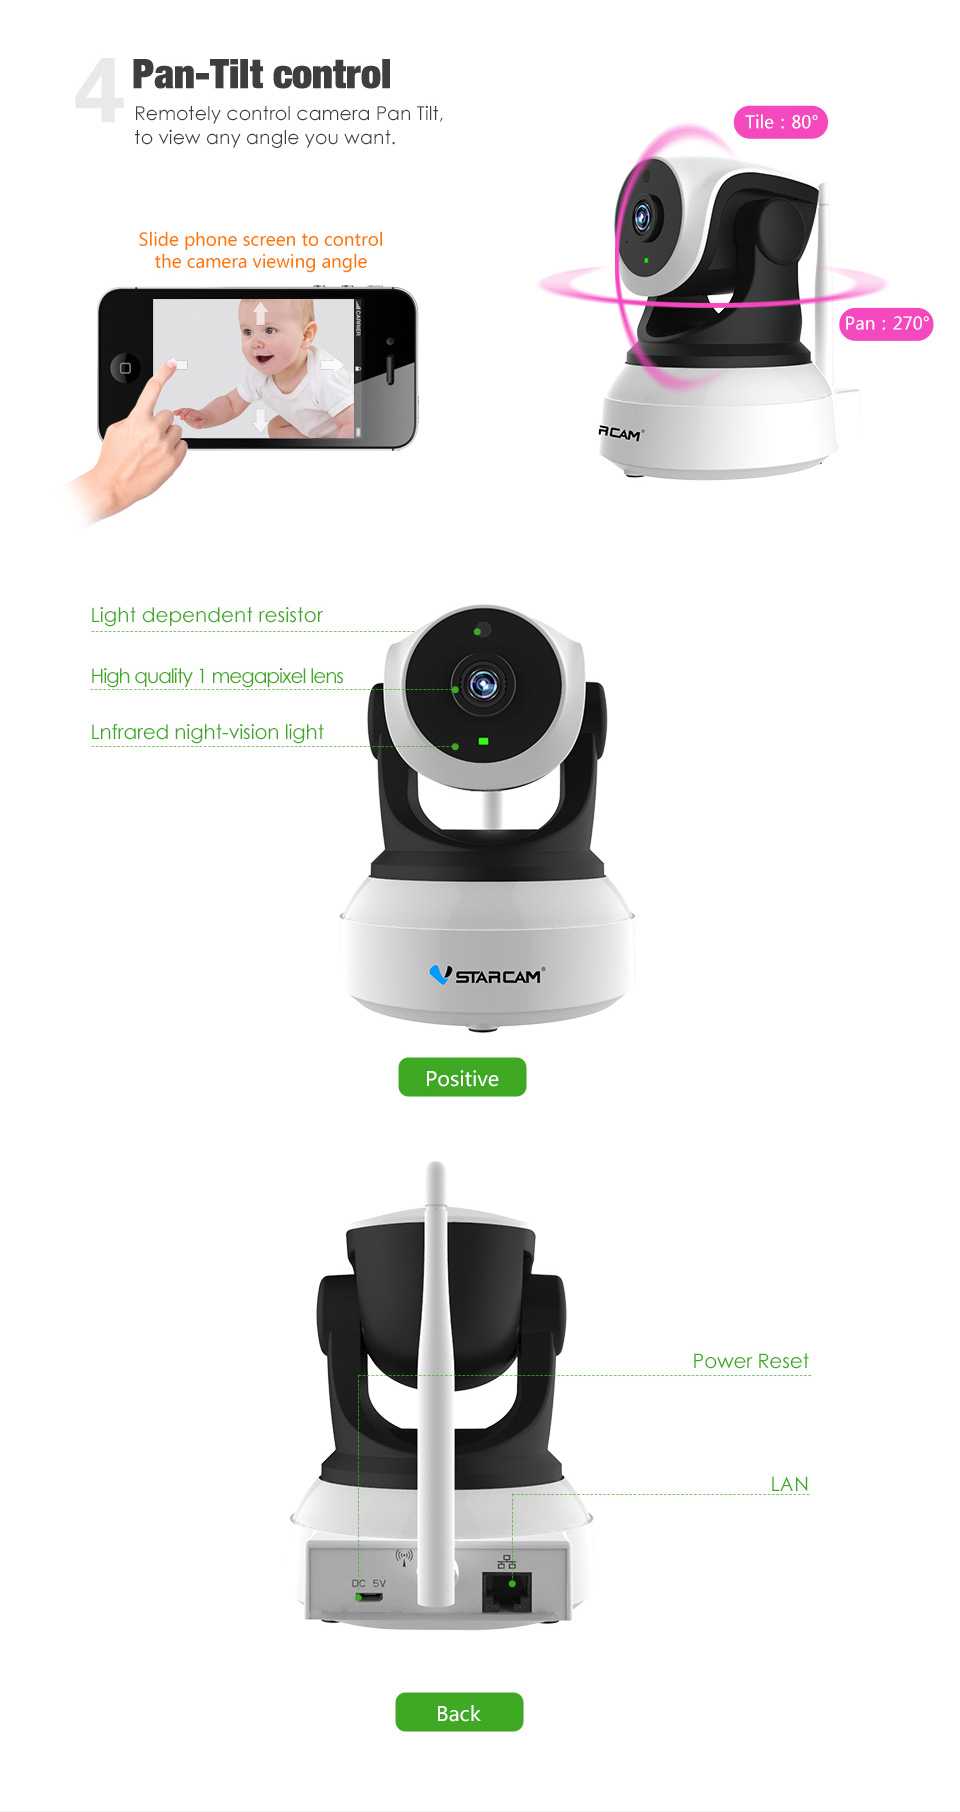 HTB1ycpTb1GSBuNjSspbq6AiipXaj Vstarcam C7824WIP HD WIFI IP Camera 720P Night Vision home Security Camera Wireless P2P Indoor IR cam PTZ IP Camara Audio ONVIF